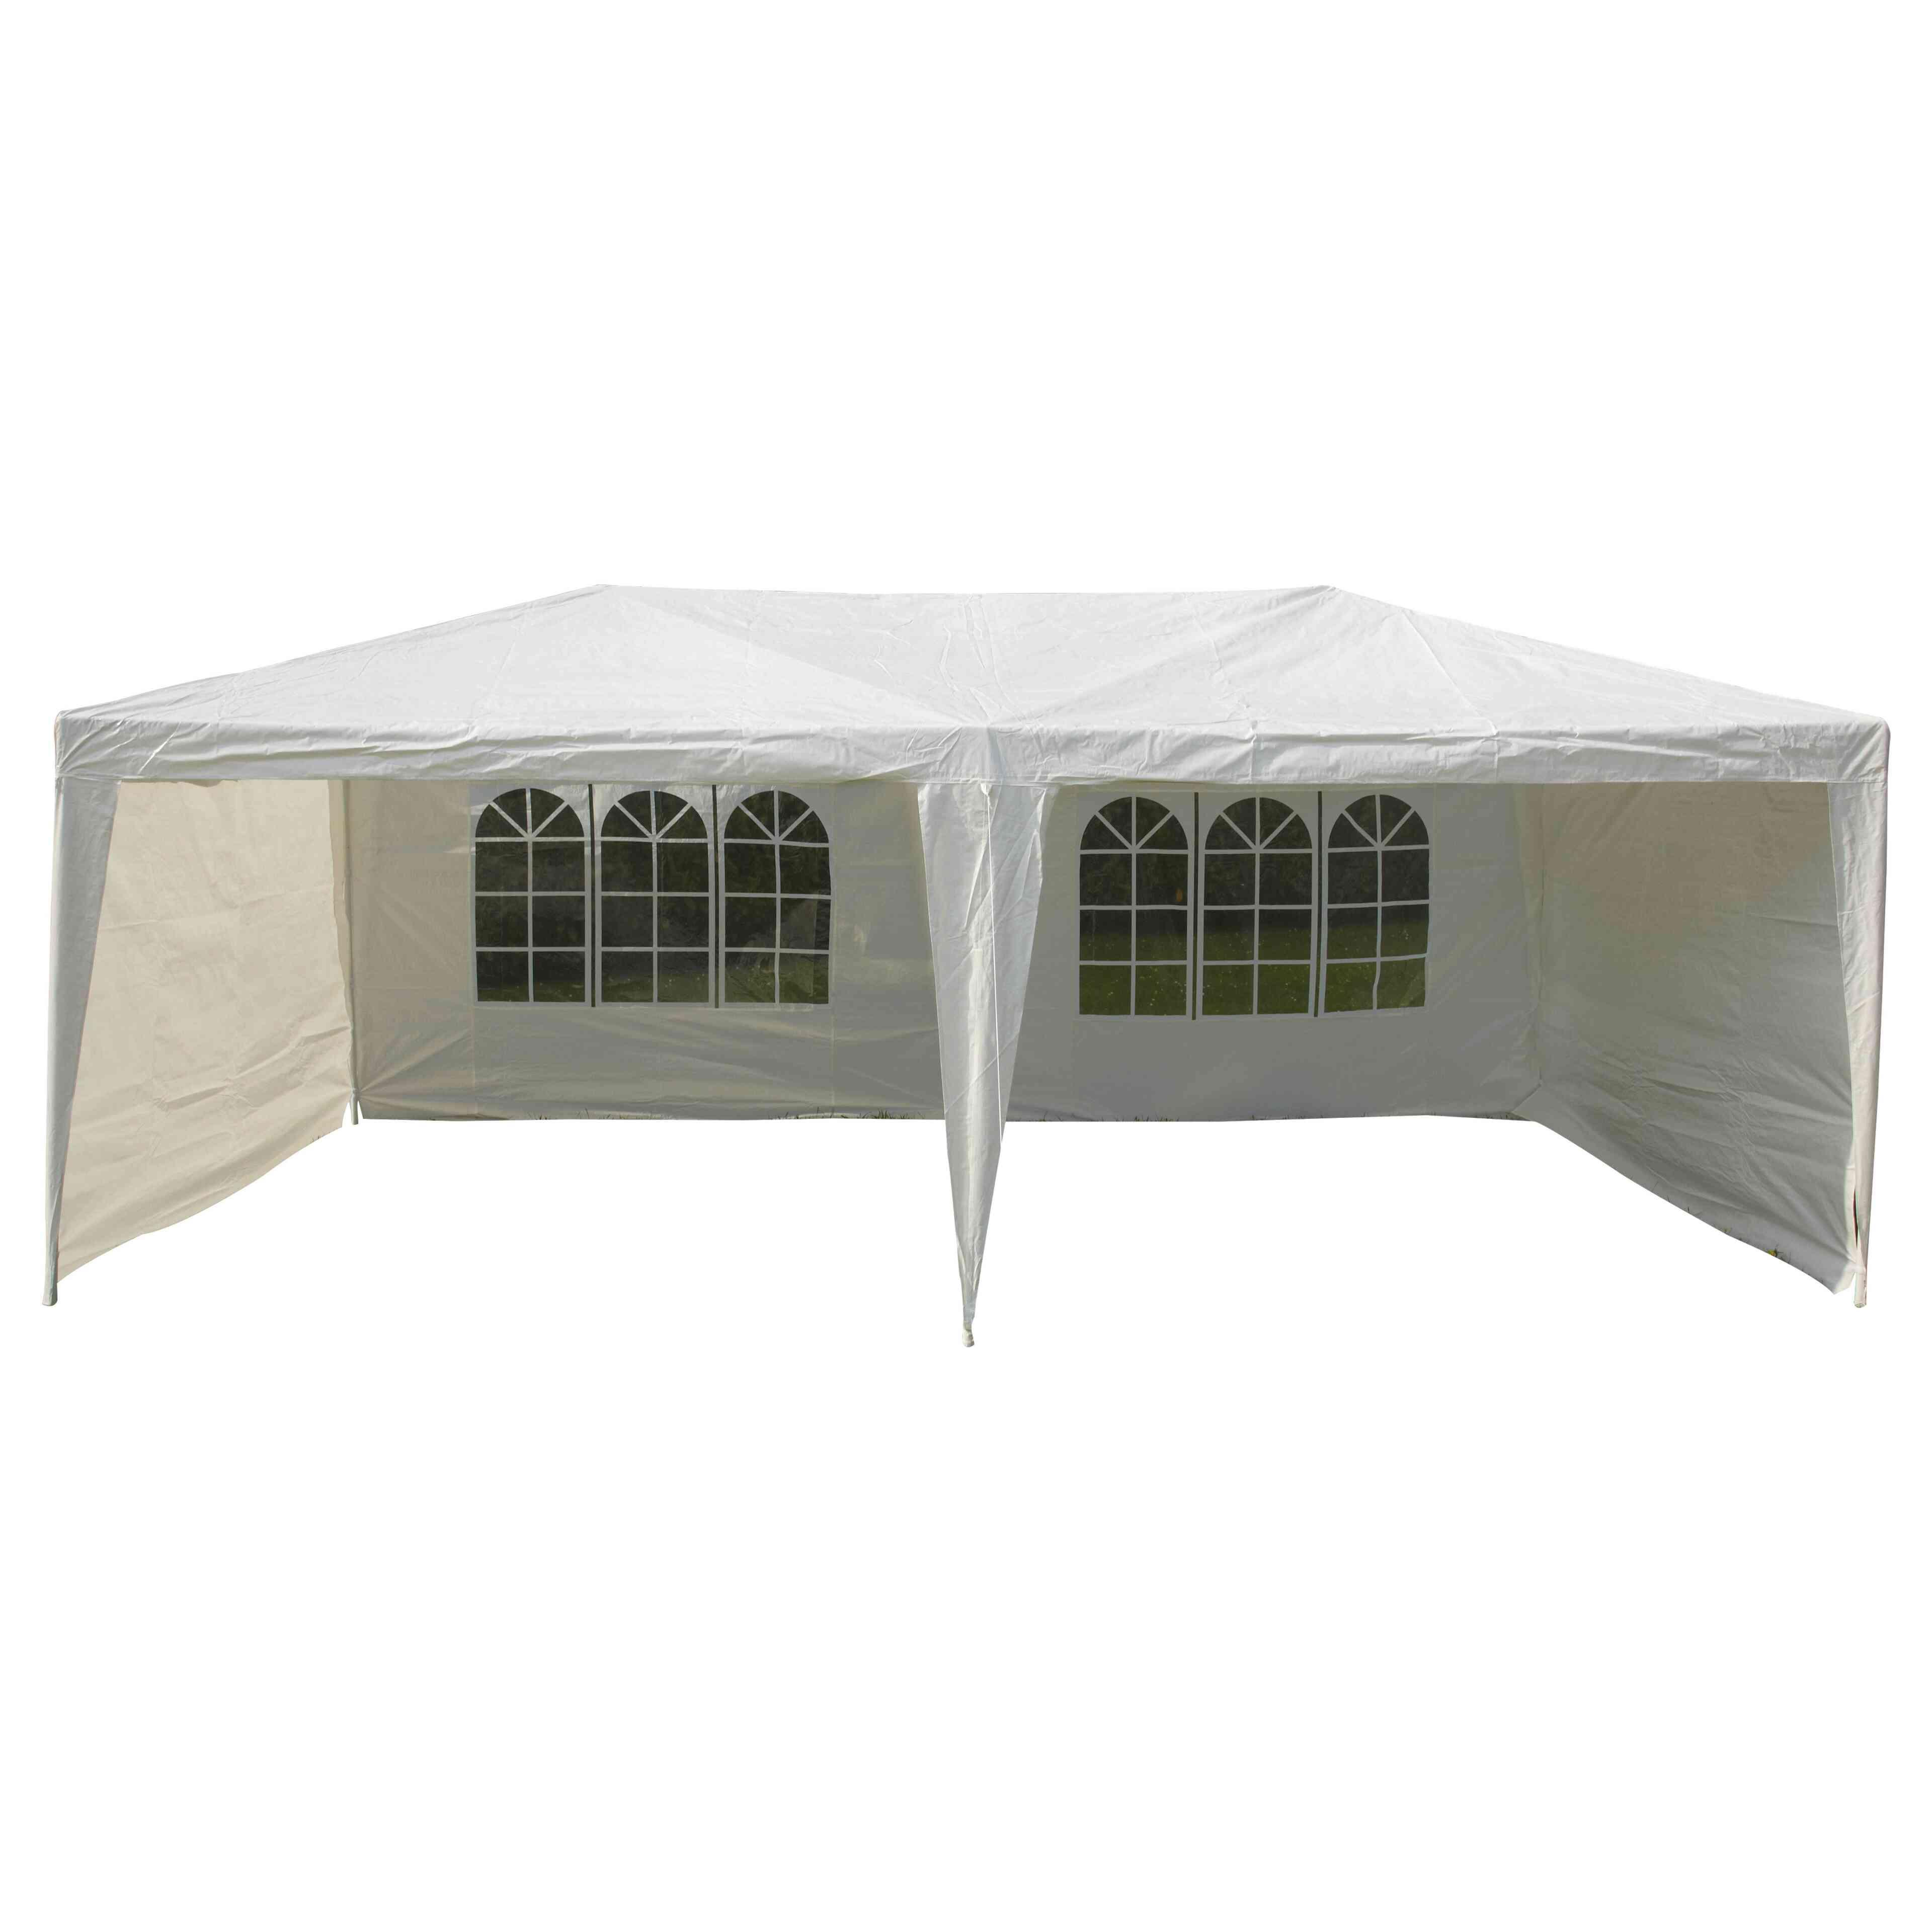 tente mariage top tarif location tente chapiteau mariage. Black Bedroom Furniture Sets. Home Design Ideas